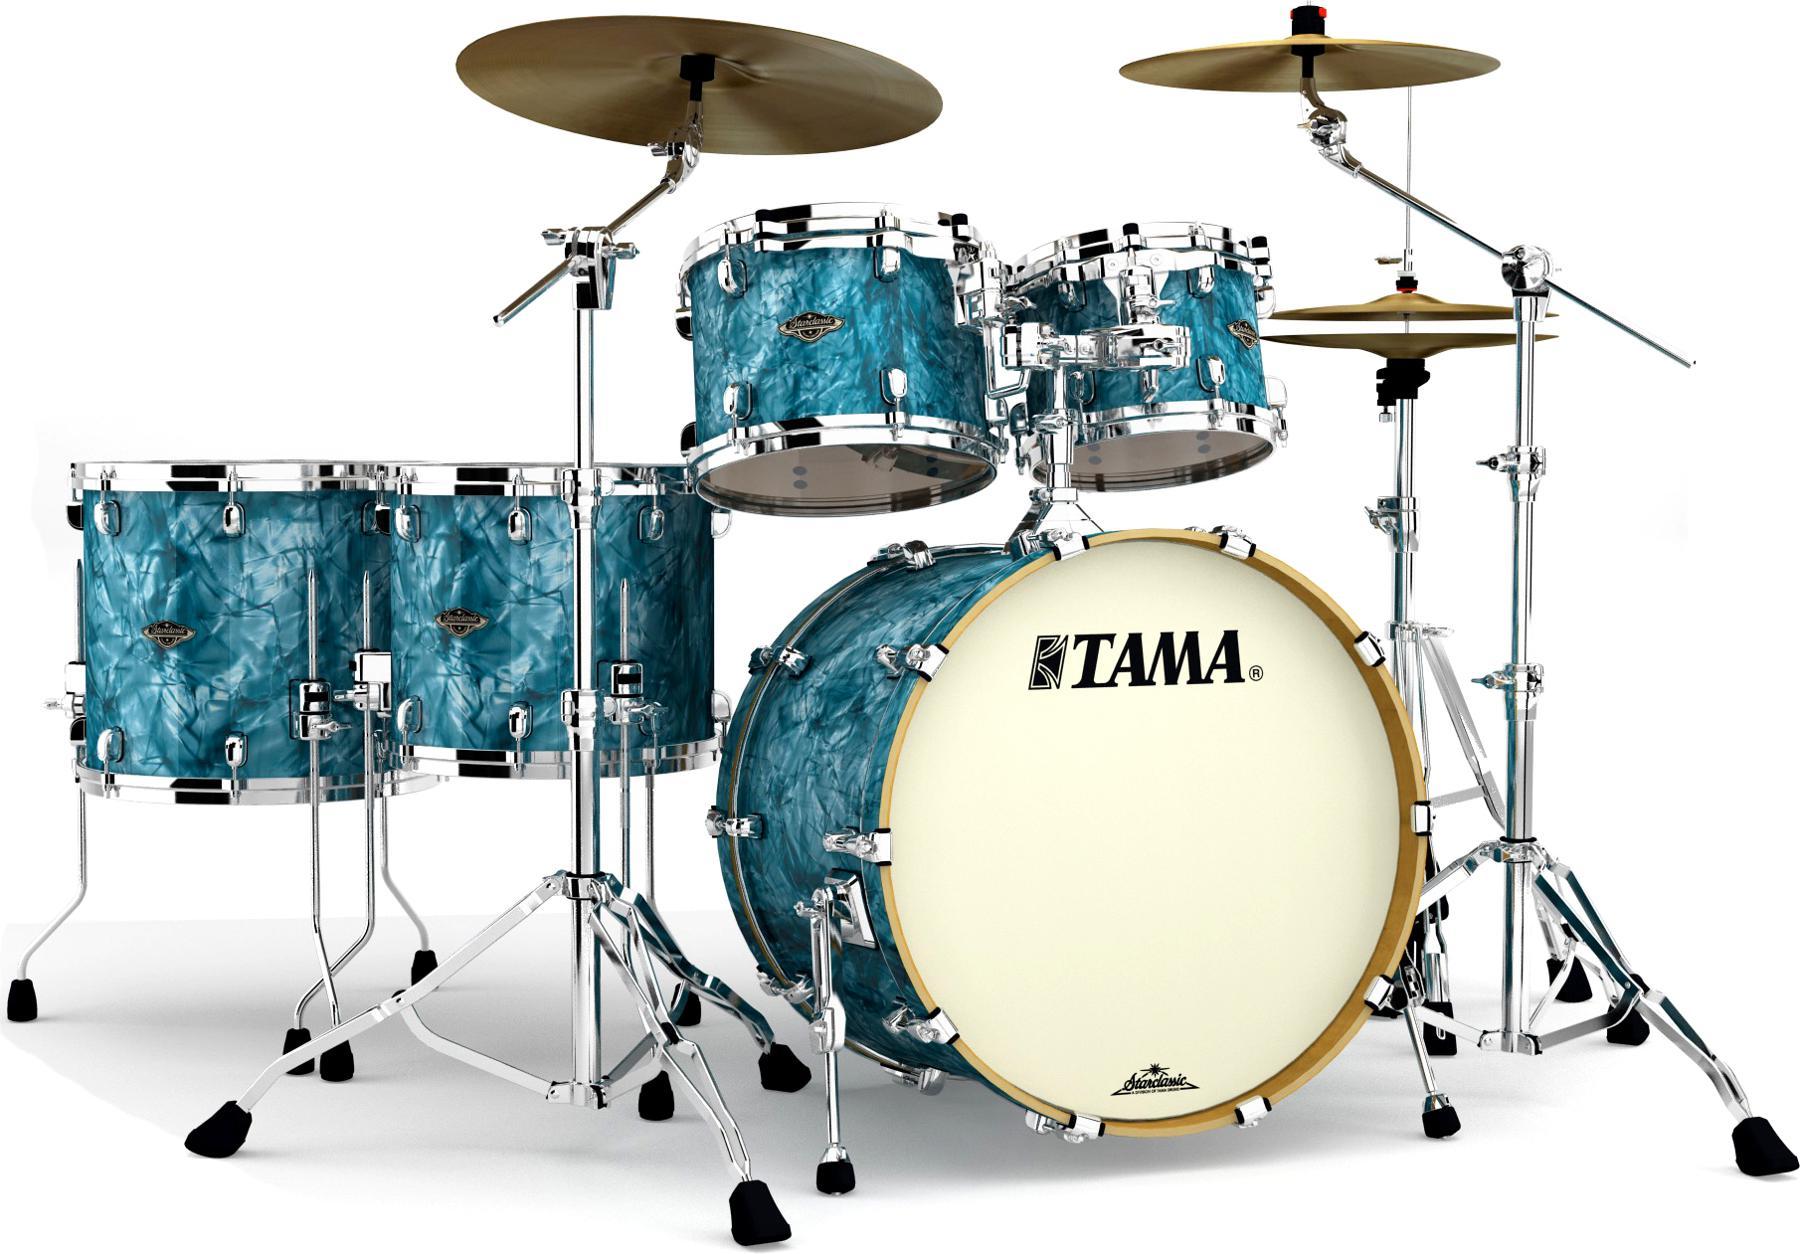 Tama Starclassic Shell Pack